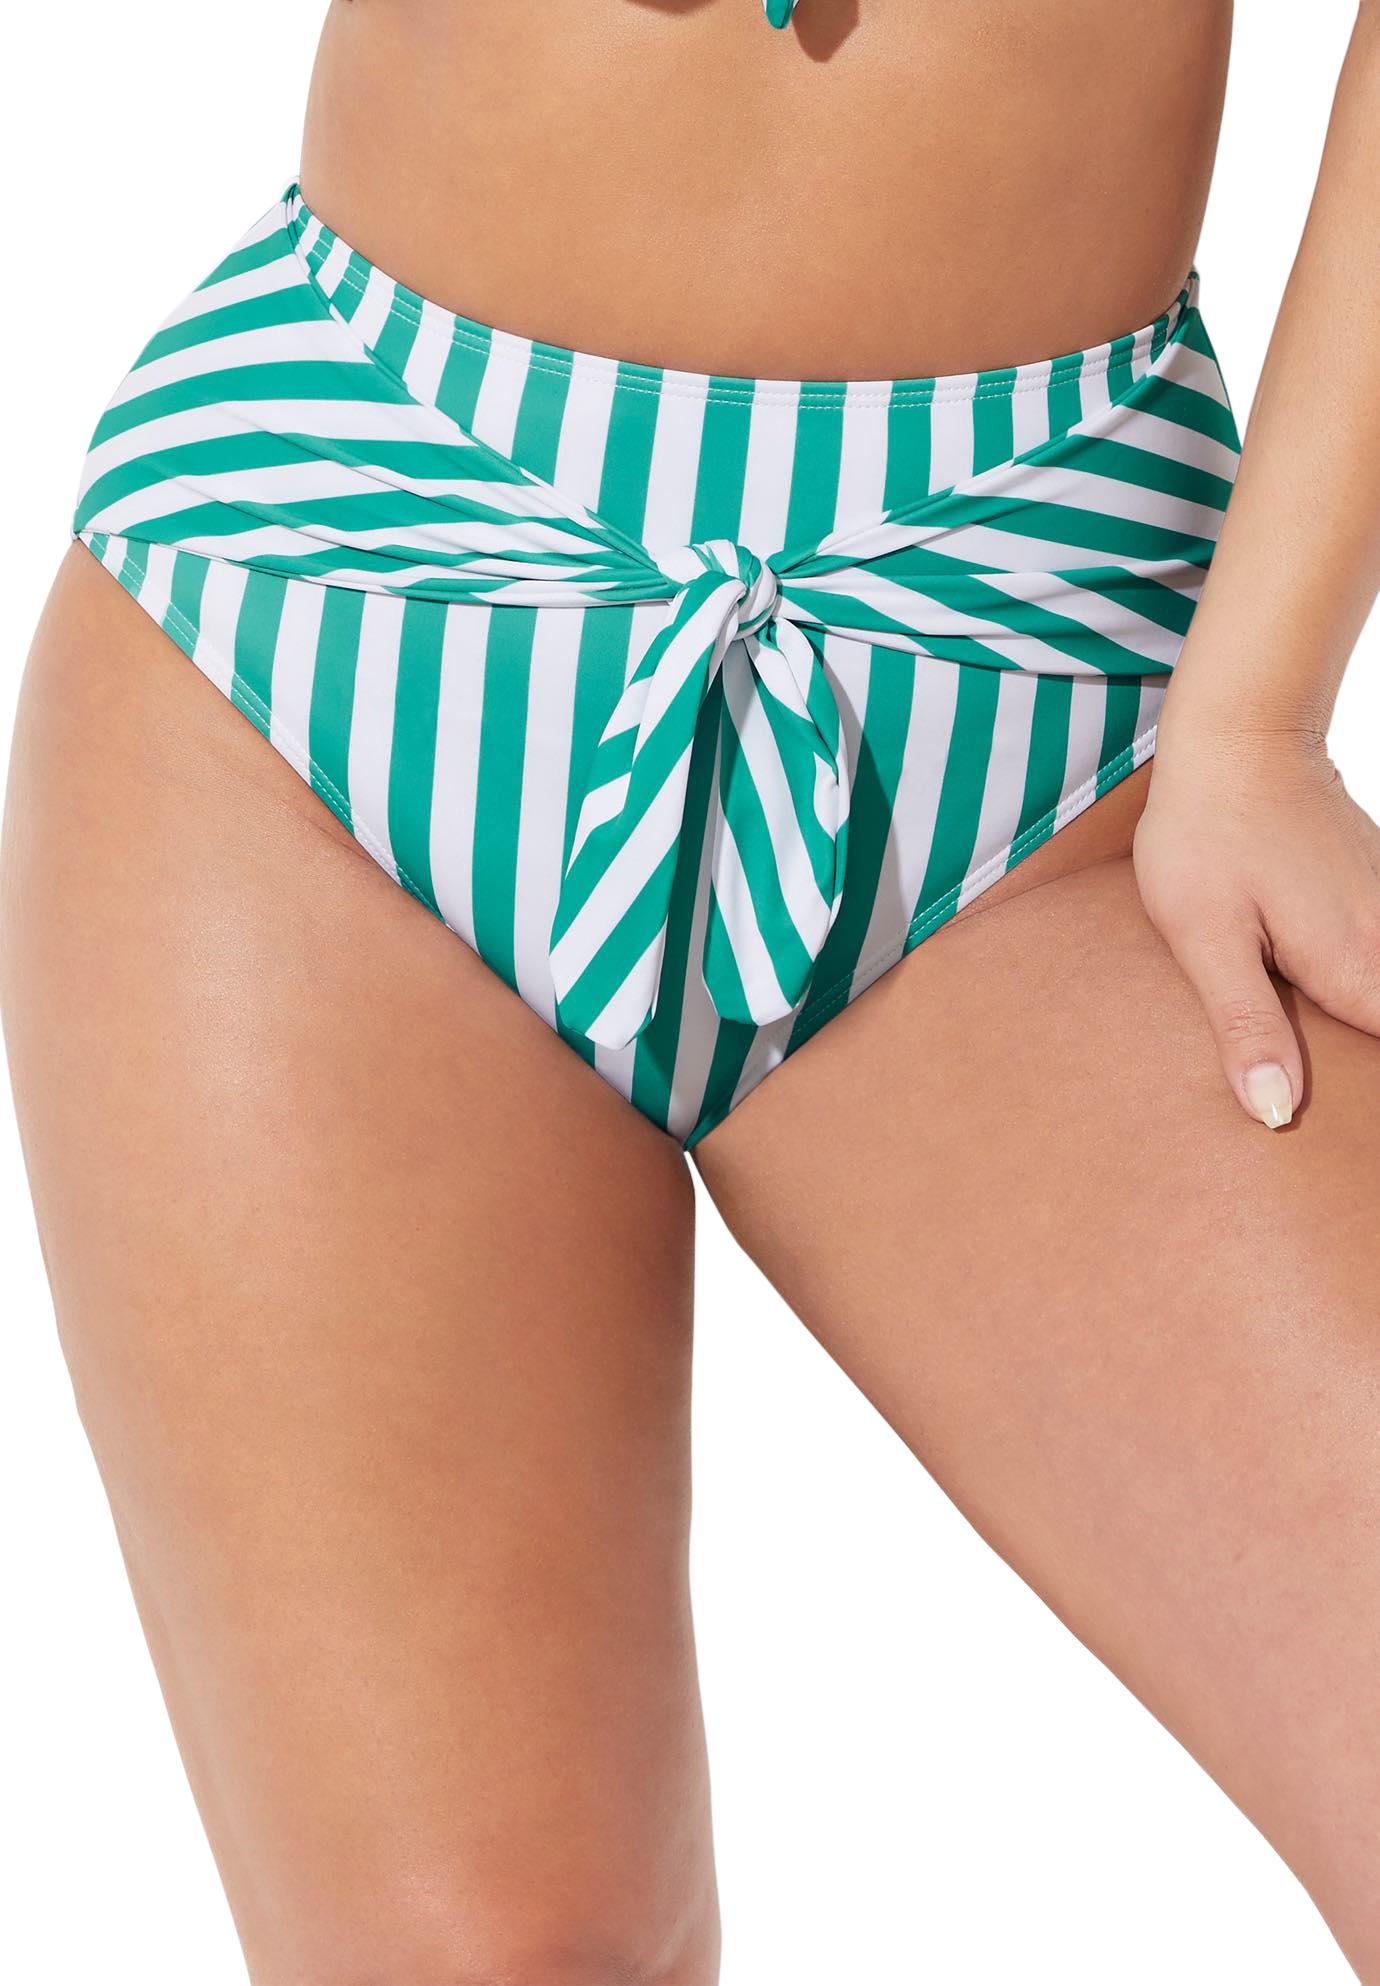 Plus Size Women's GabiFresh Tie Front Bikini Bottom by Swimsuits For All in Aloe White Stripe